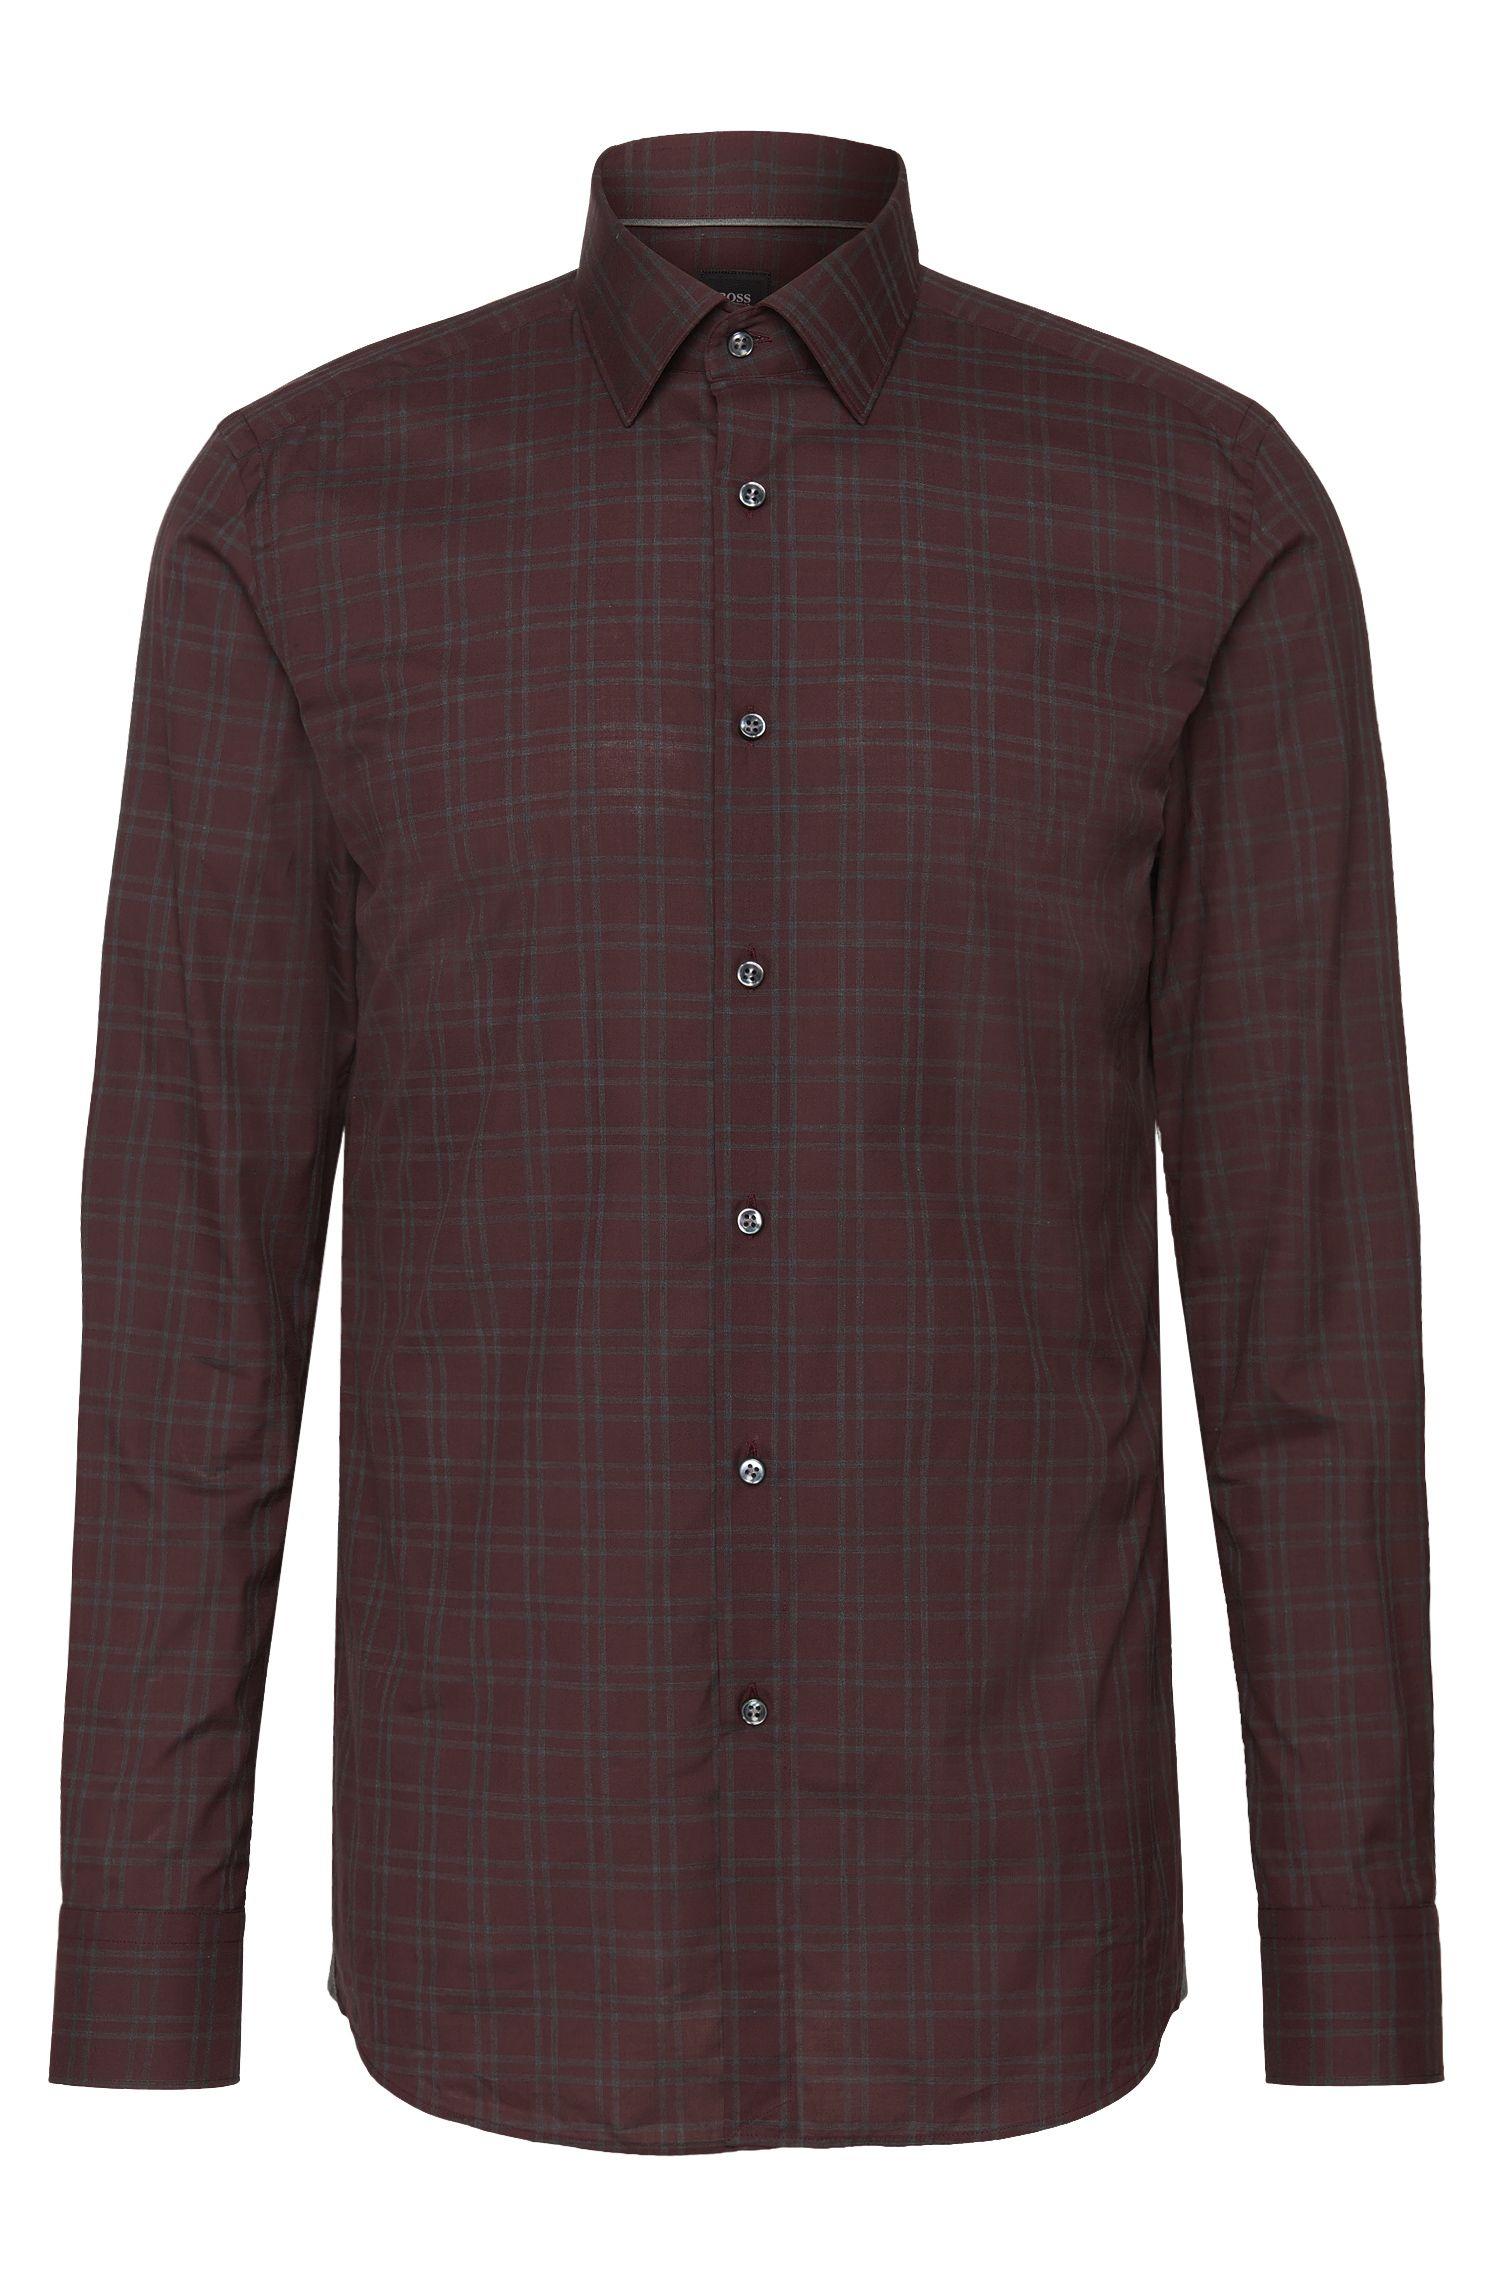 'T-Scott'   Slim Fit, Italian Cotton Checked Dress Shirt